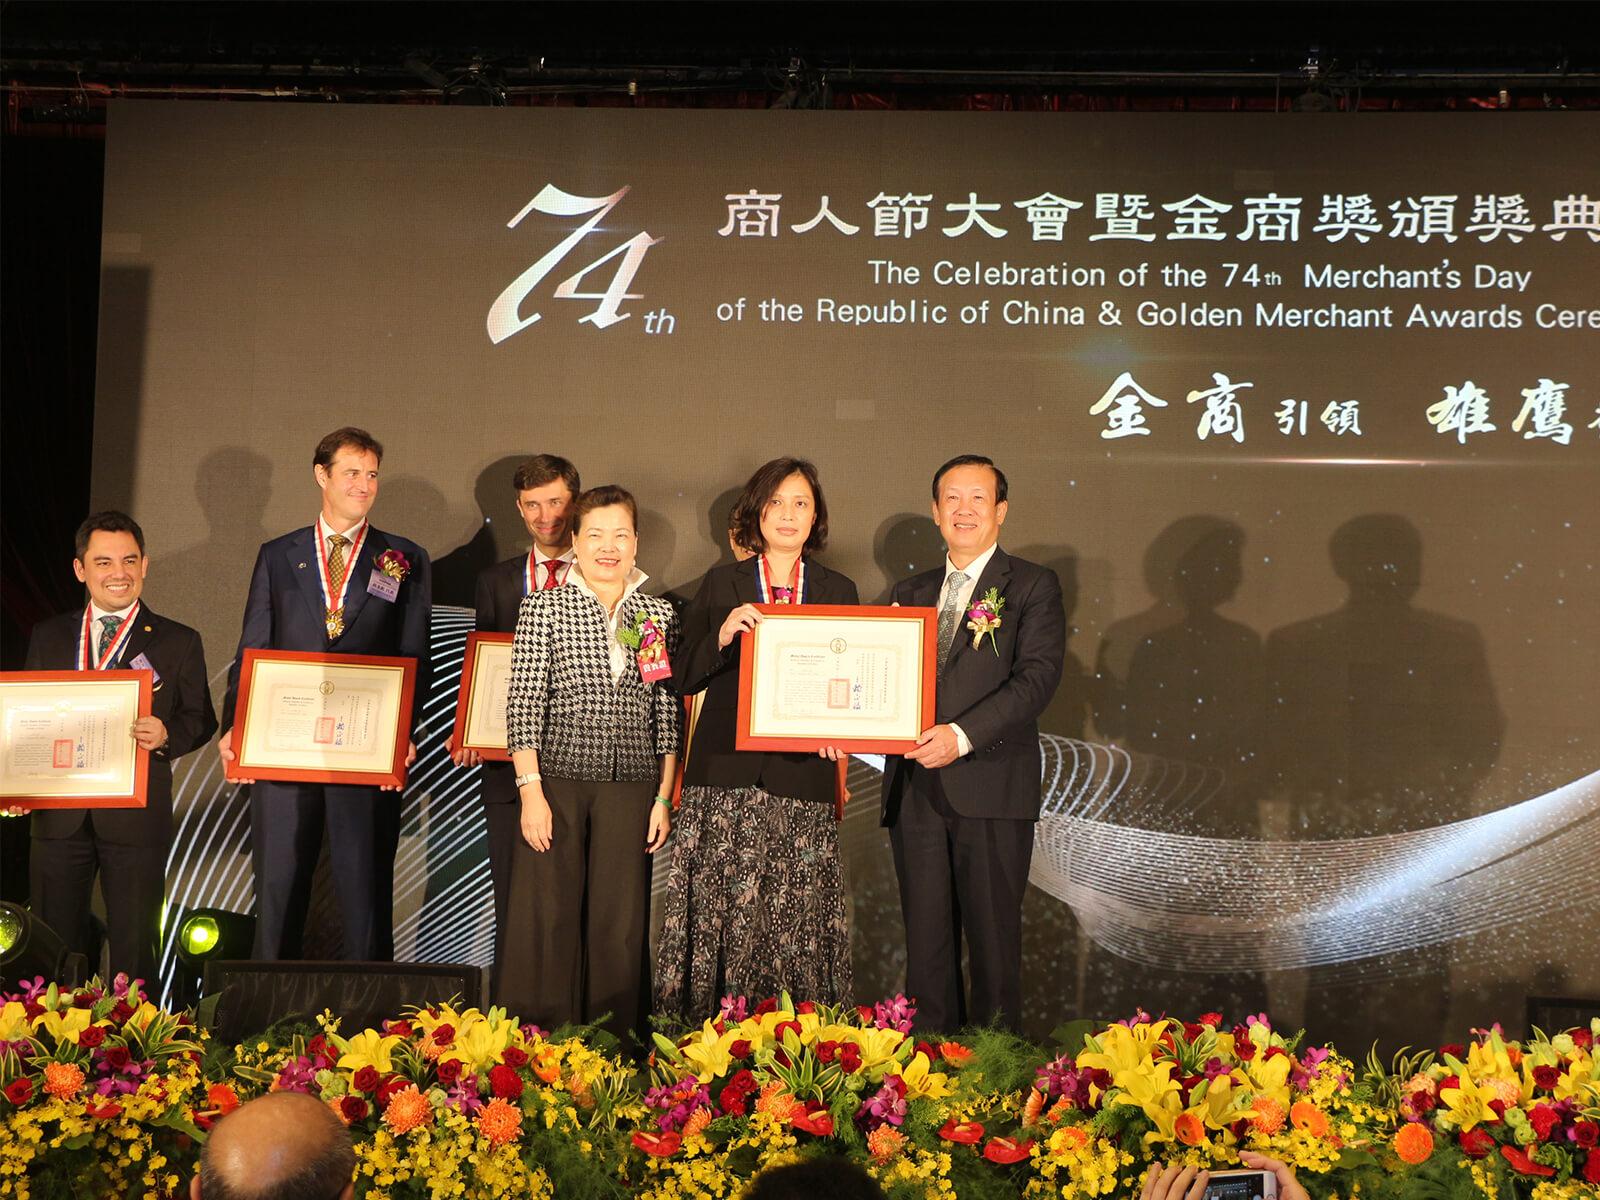 The 74th Golden Merchant Awards